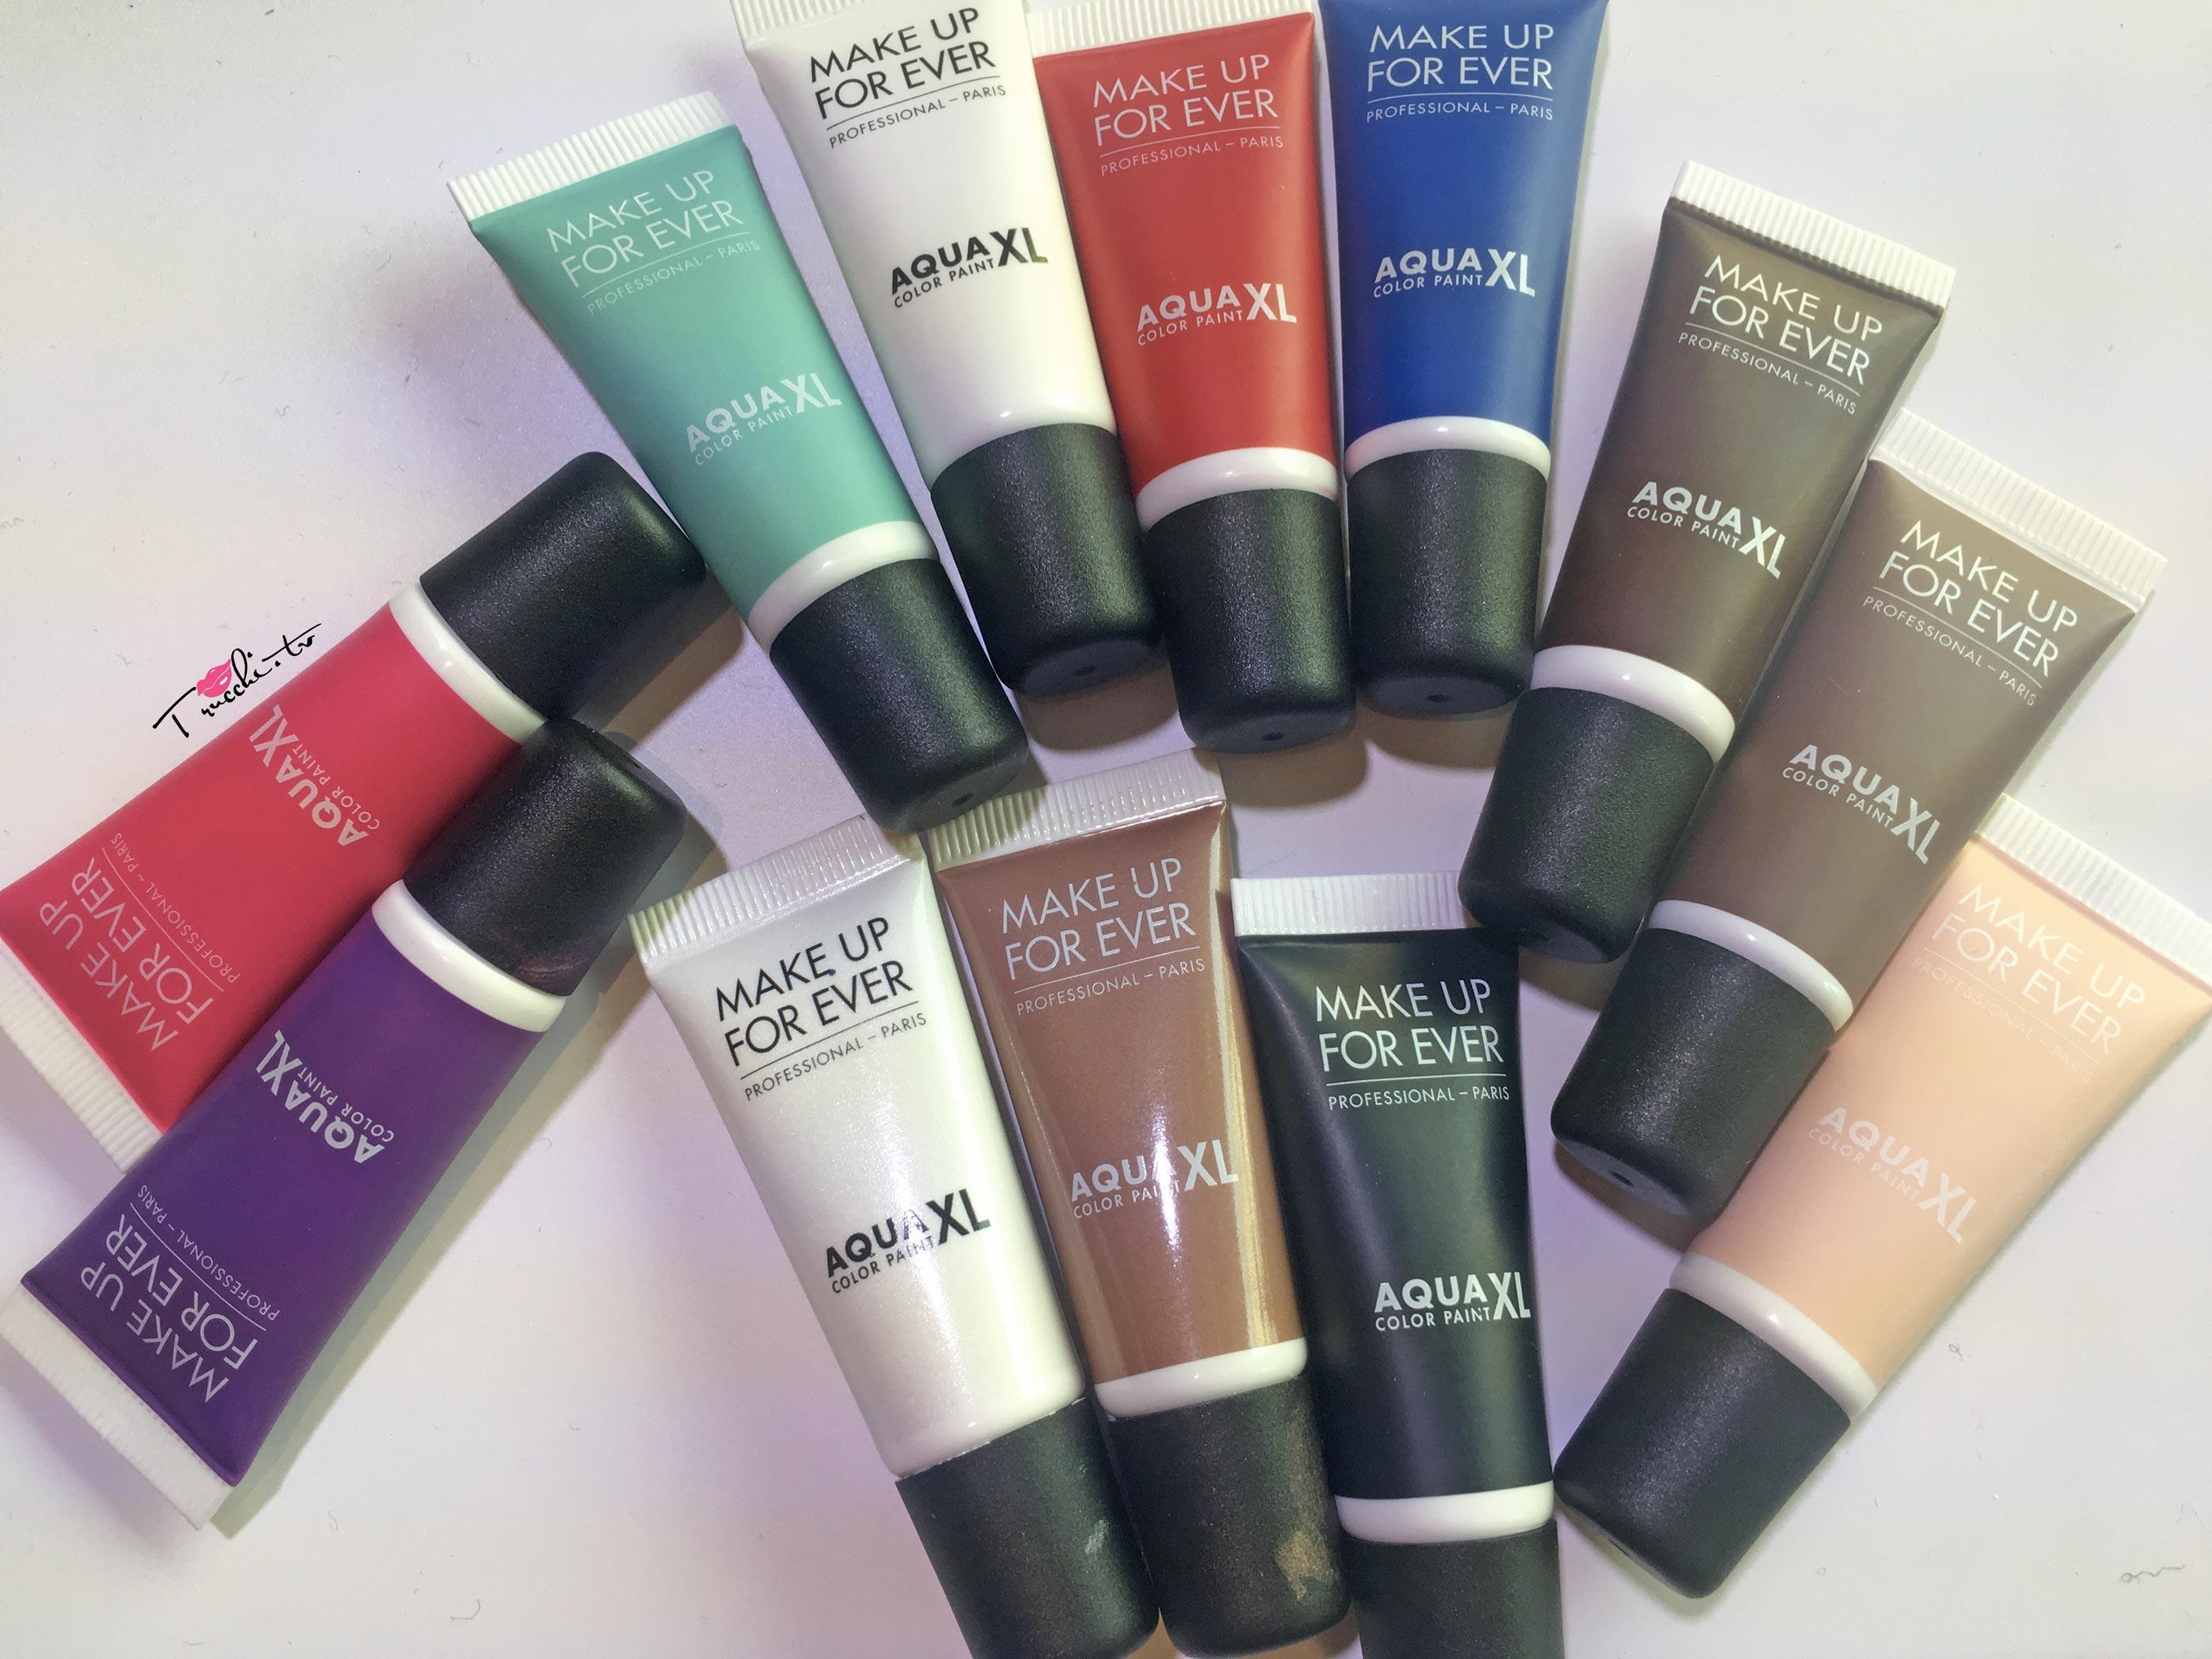 aqua color makeup forever saubhaya makeup. Black Bedroom Furniture Sets. Home Design Ideas